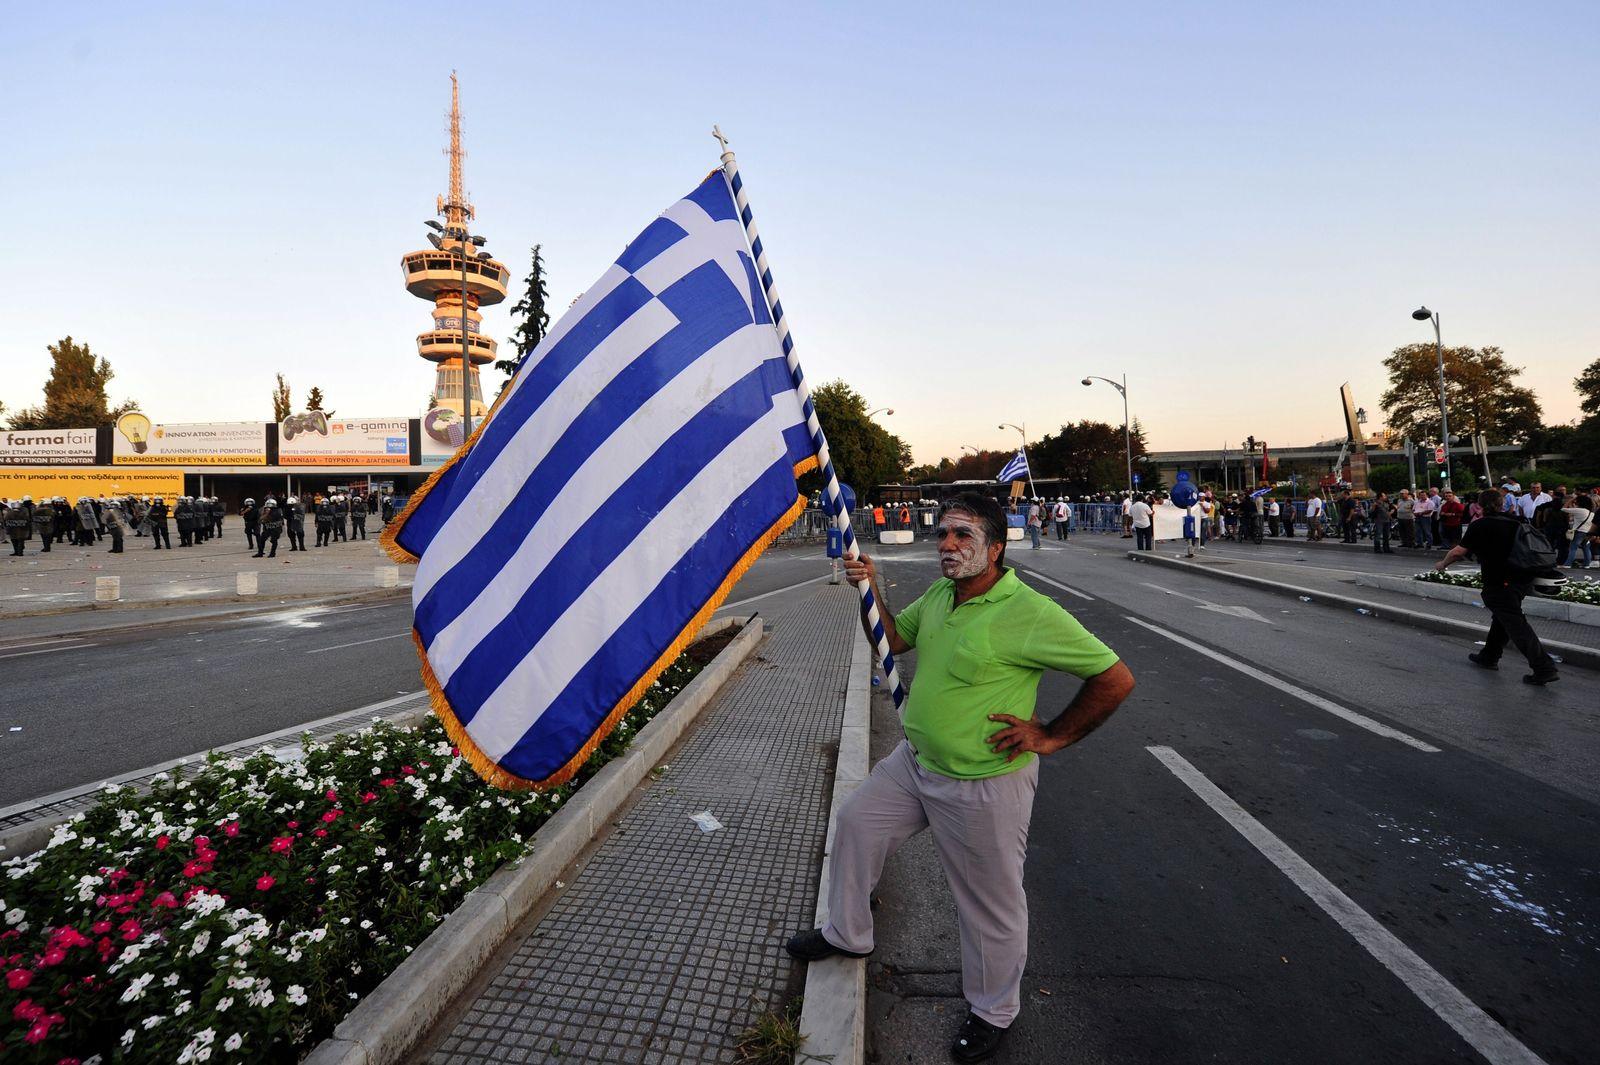 Griechenland / Proteste / Fahne